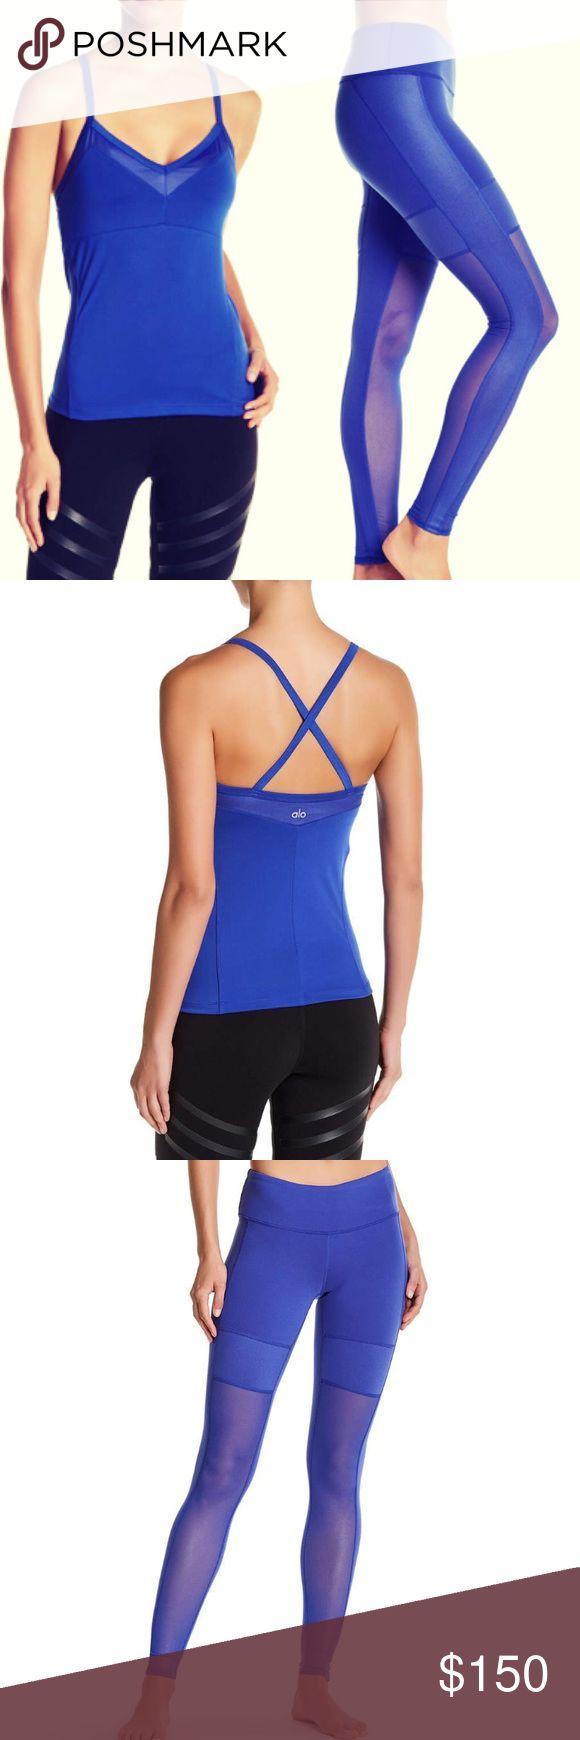 🌟NEW🌟 alo yoga // tank and leggings set NWT ALO yoga electric blue bra tank and mesh detail legging set. Fits TTS! ALO Yoga Pants Leggings